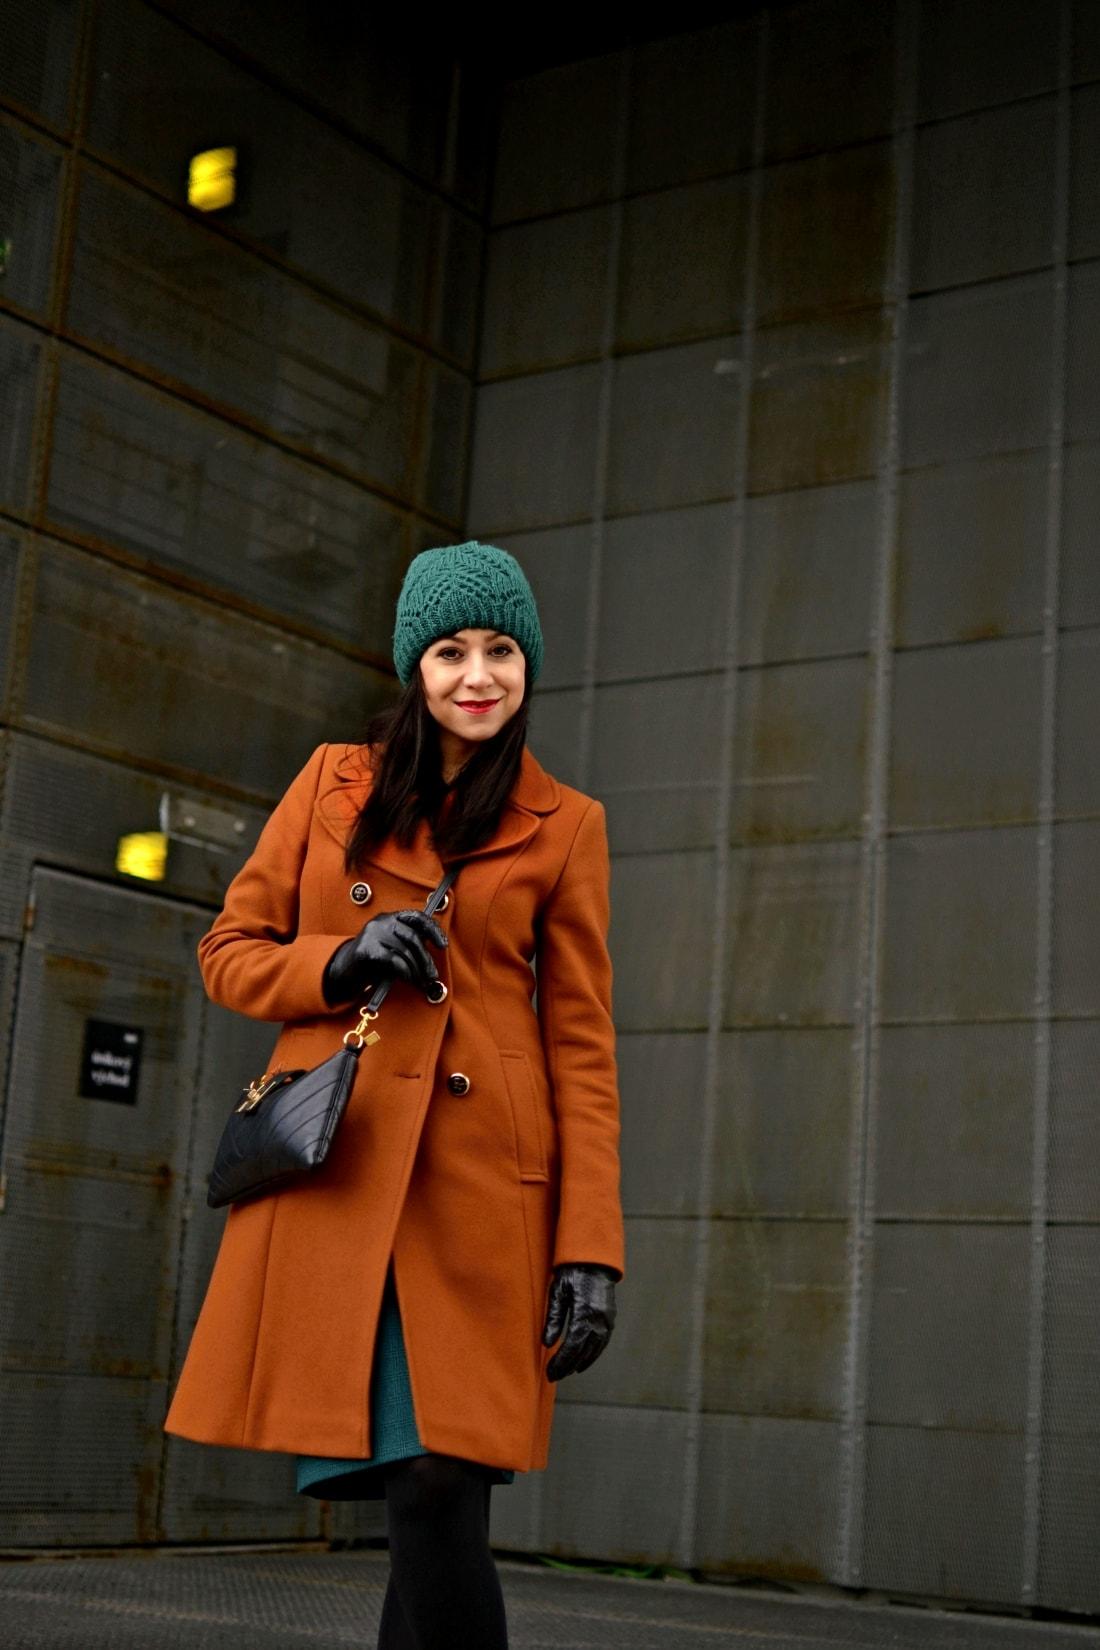 katharine-fashion-is-beautiful-blog-sukna-outfit-3